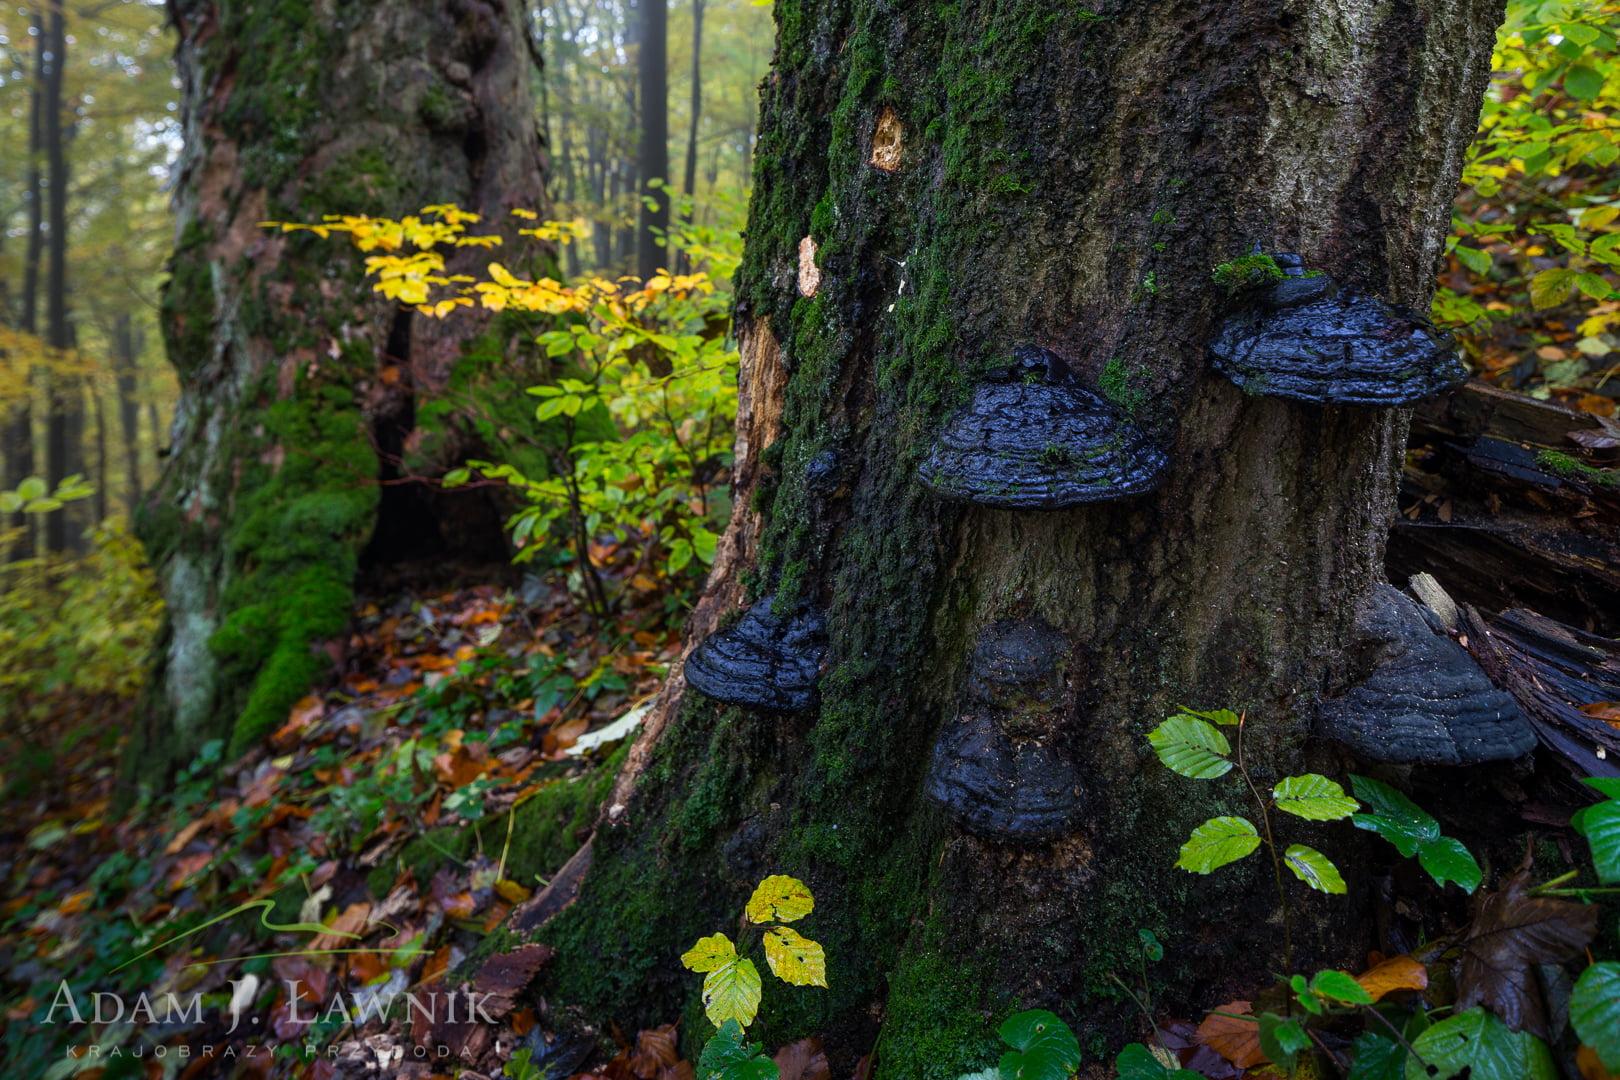 Magura National Park, Poland 1510-00919C